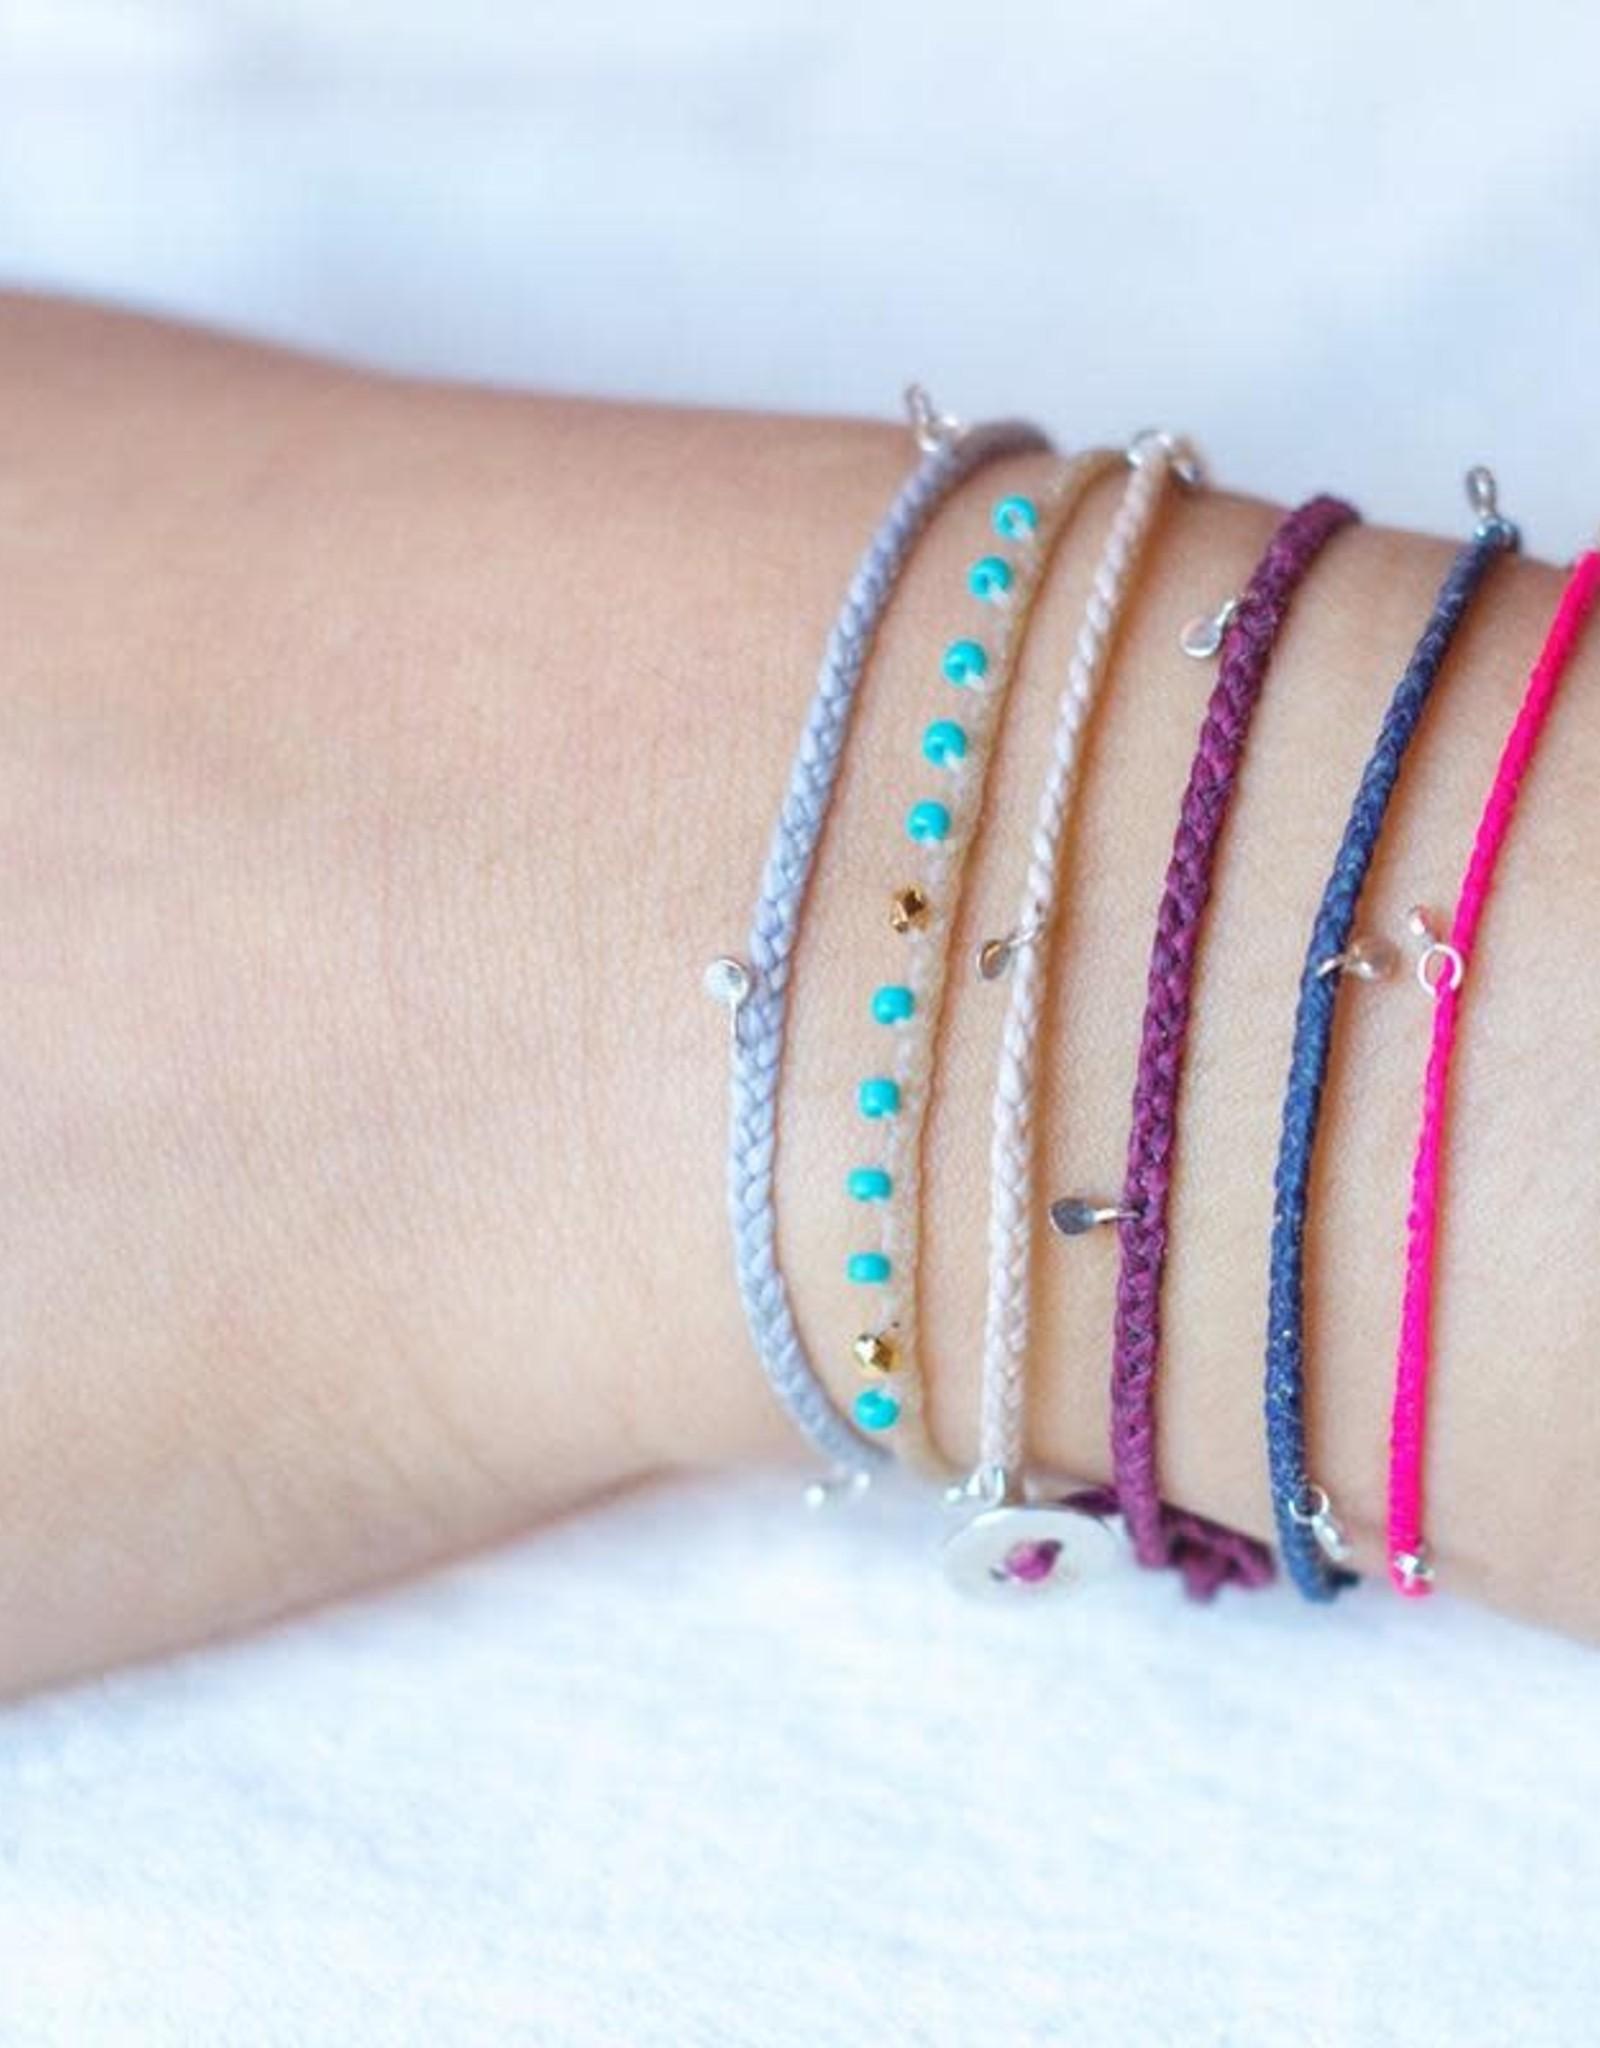 Scosha Fairy Bead Signature Brass Bracelet - Lavender